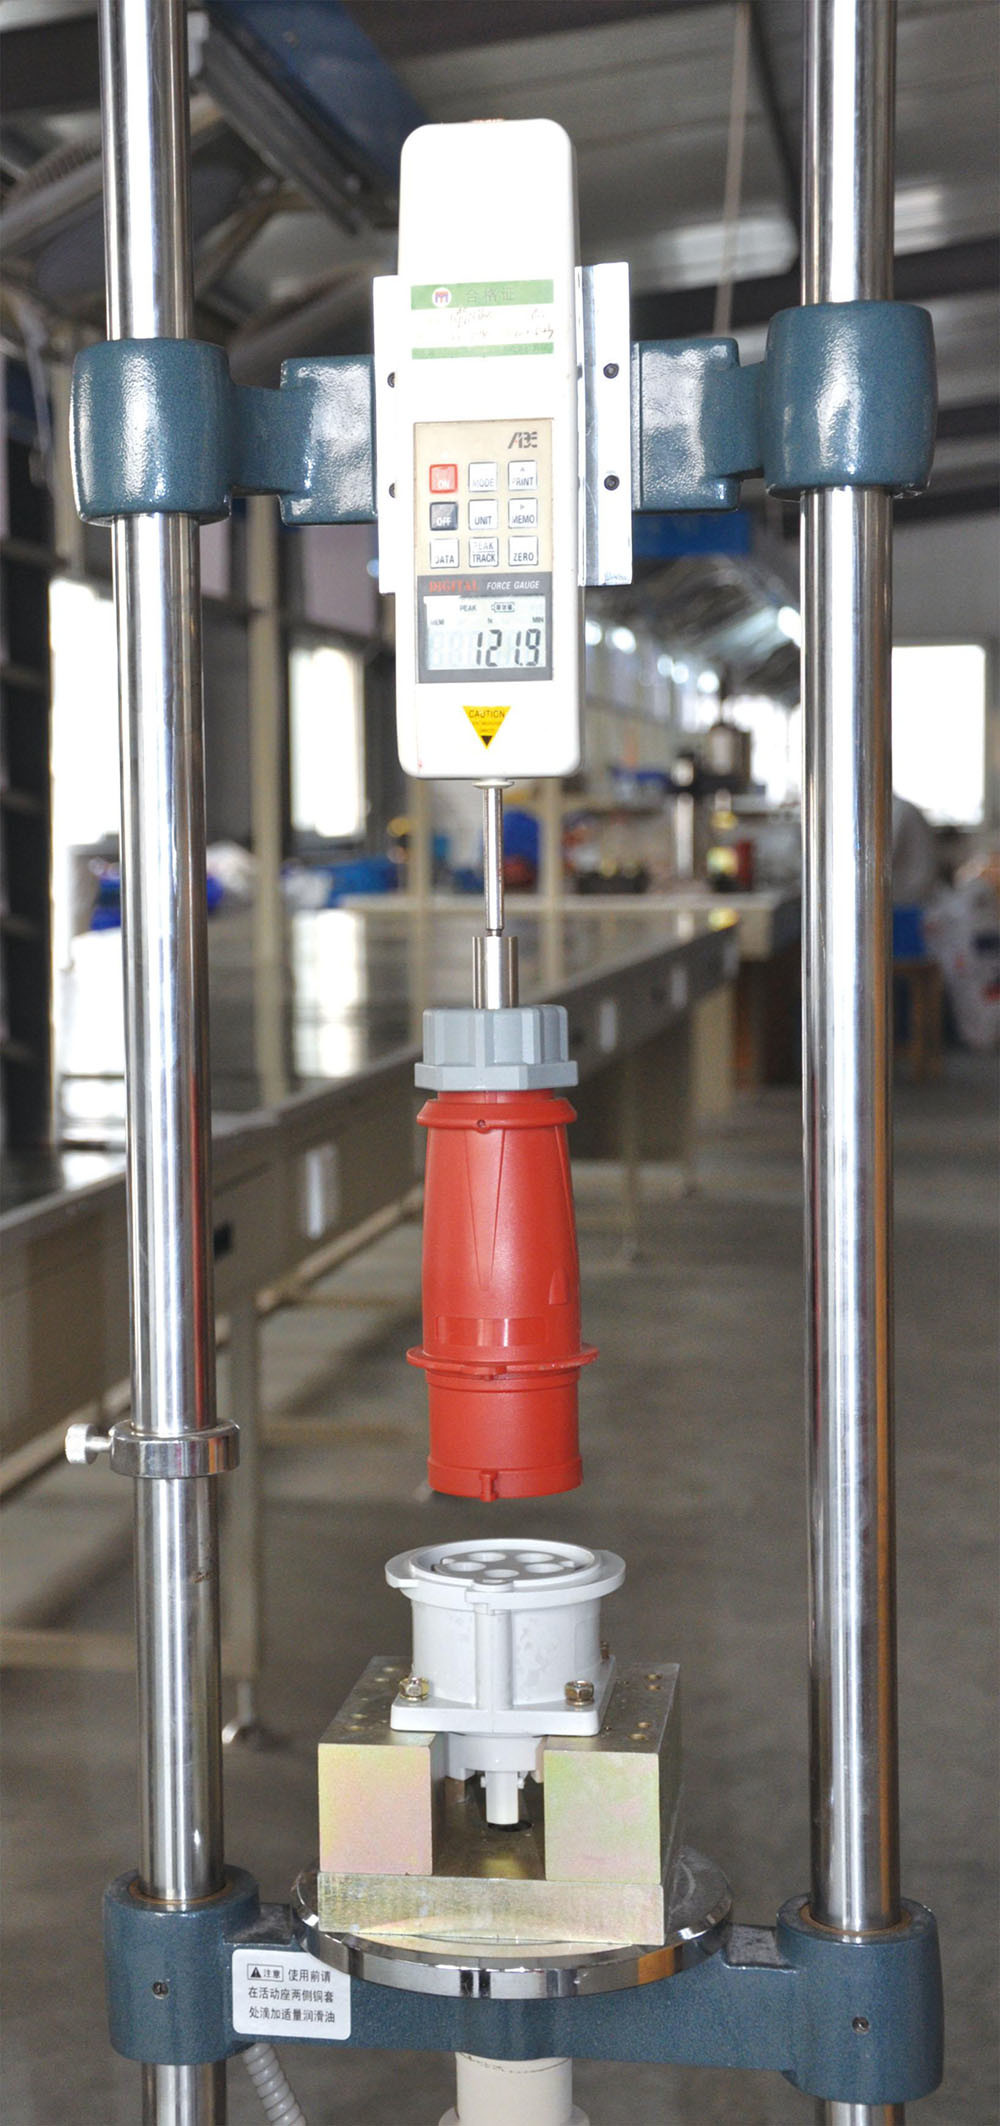 IP67 32A 2p+E Cee Waterproof Industrial Plug